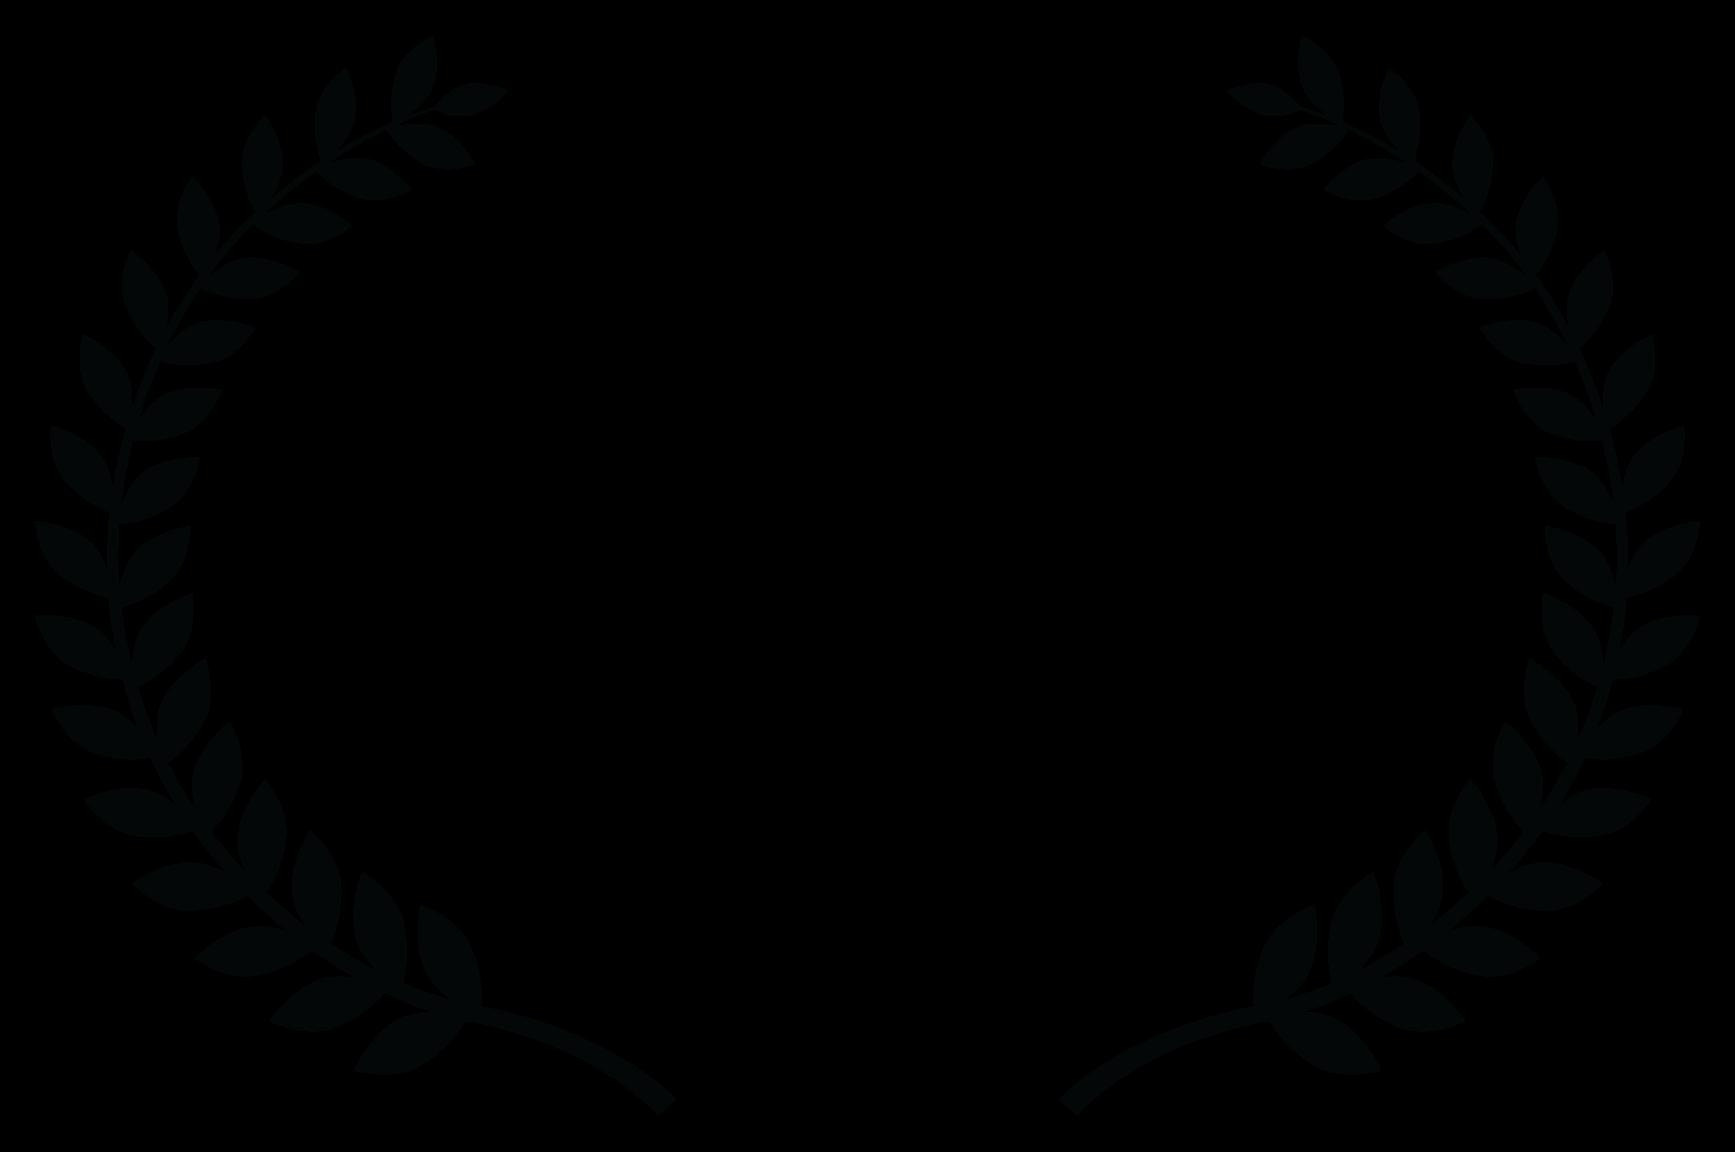 OFFICIAL SELECTION - Mobile Filmakers International Fest - 2021